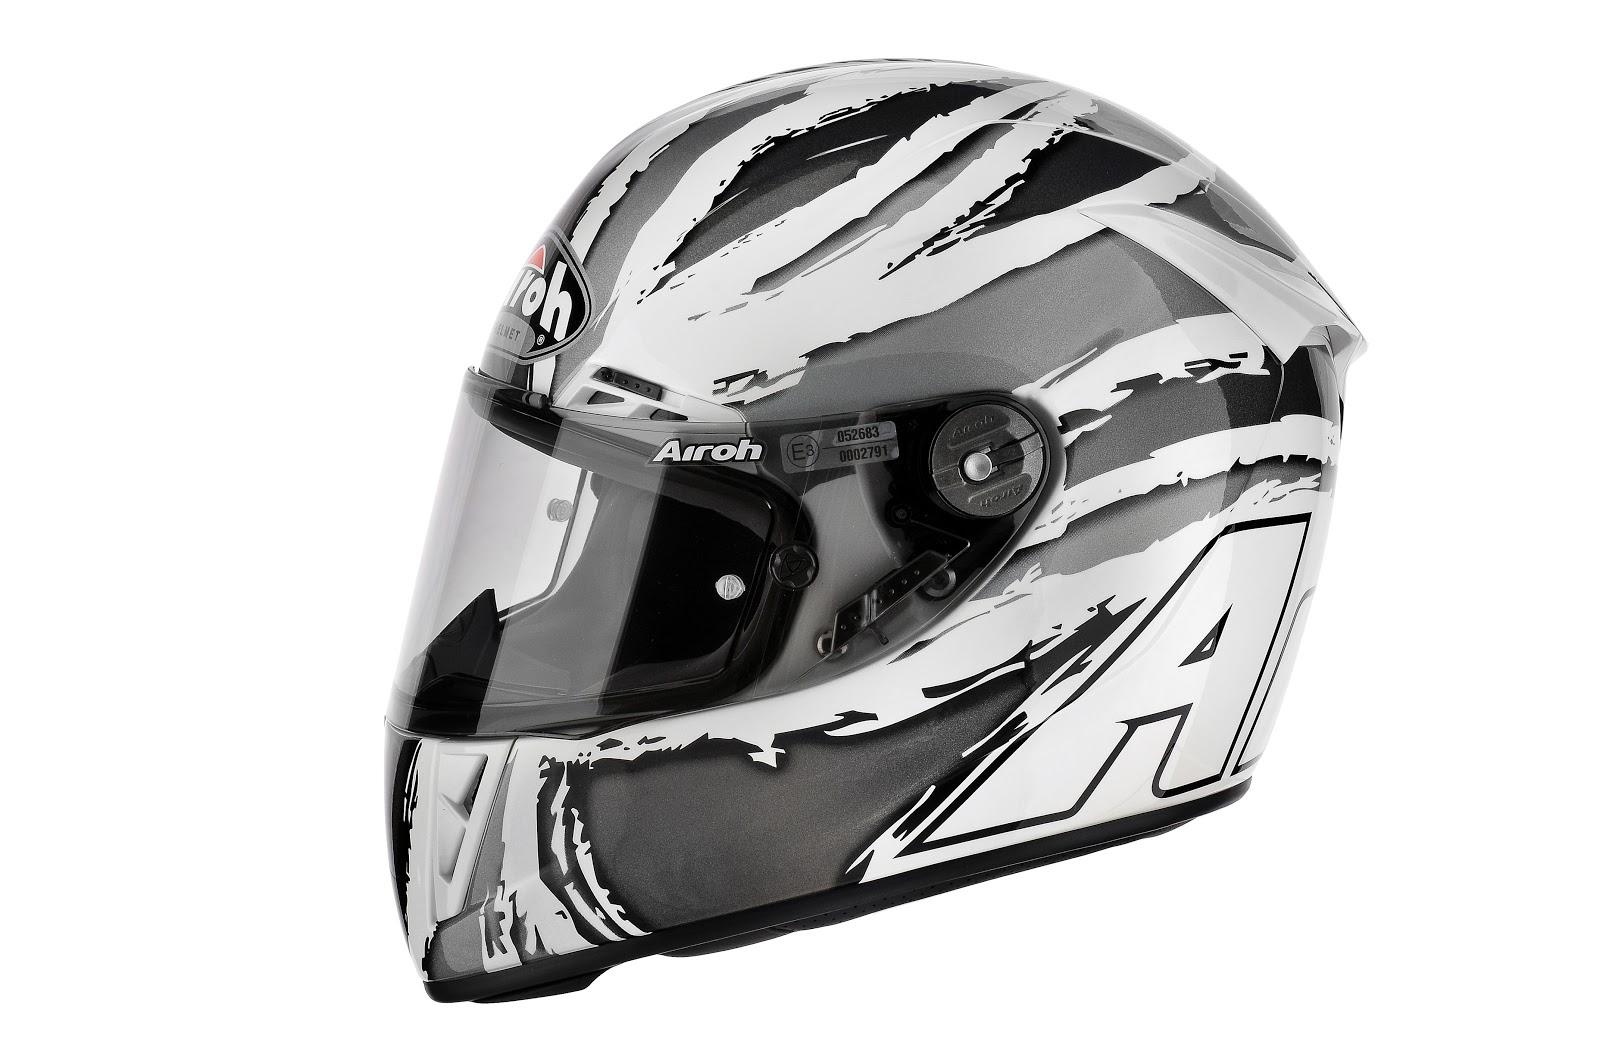 Casque Airoh Helmet Bargy Design Passion Moto Et Voyage